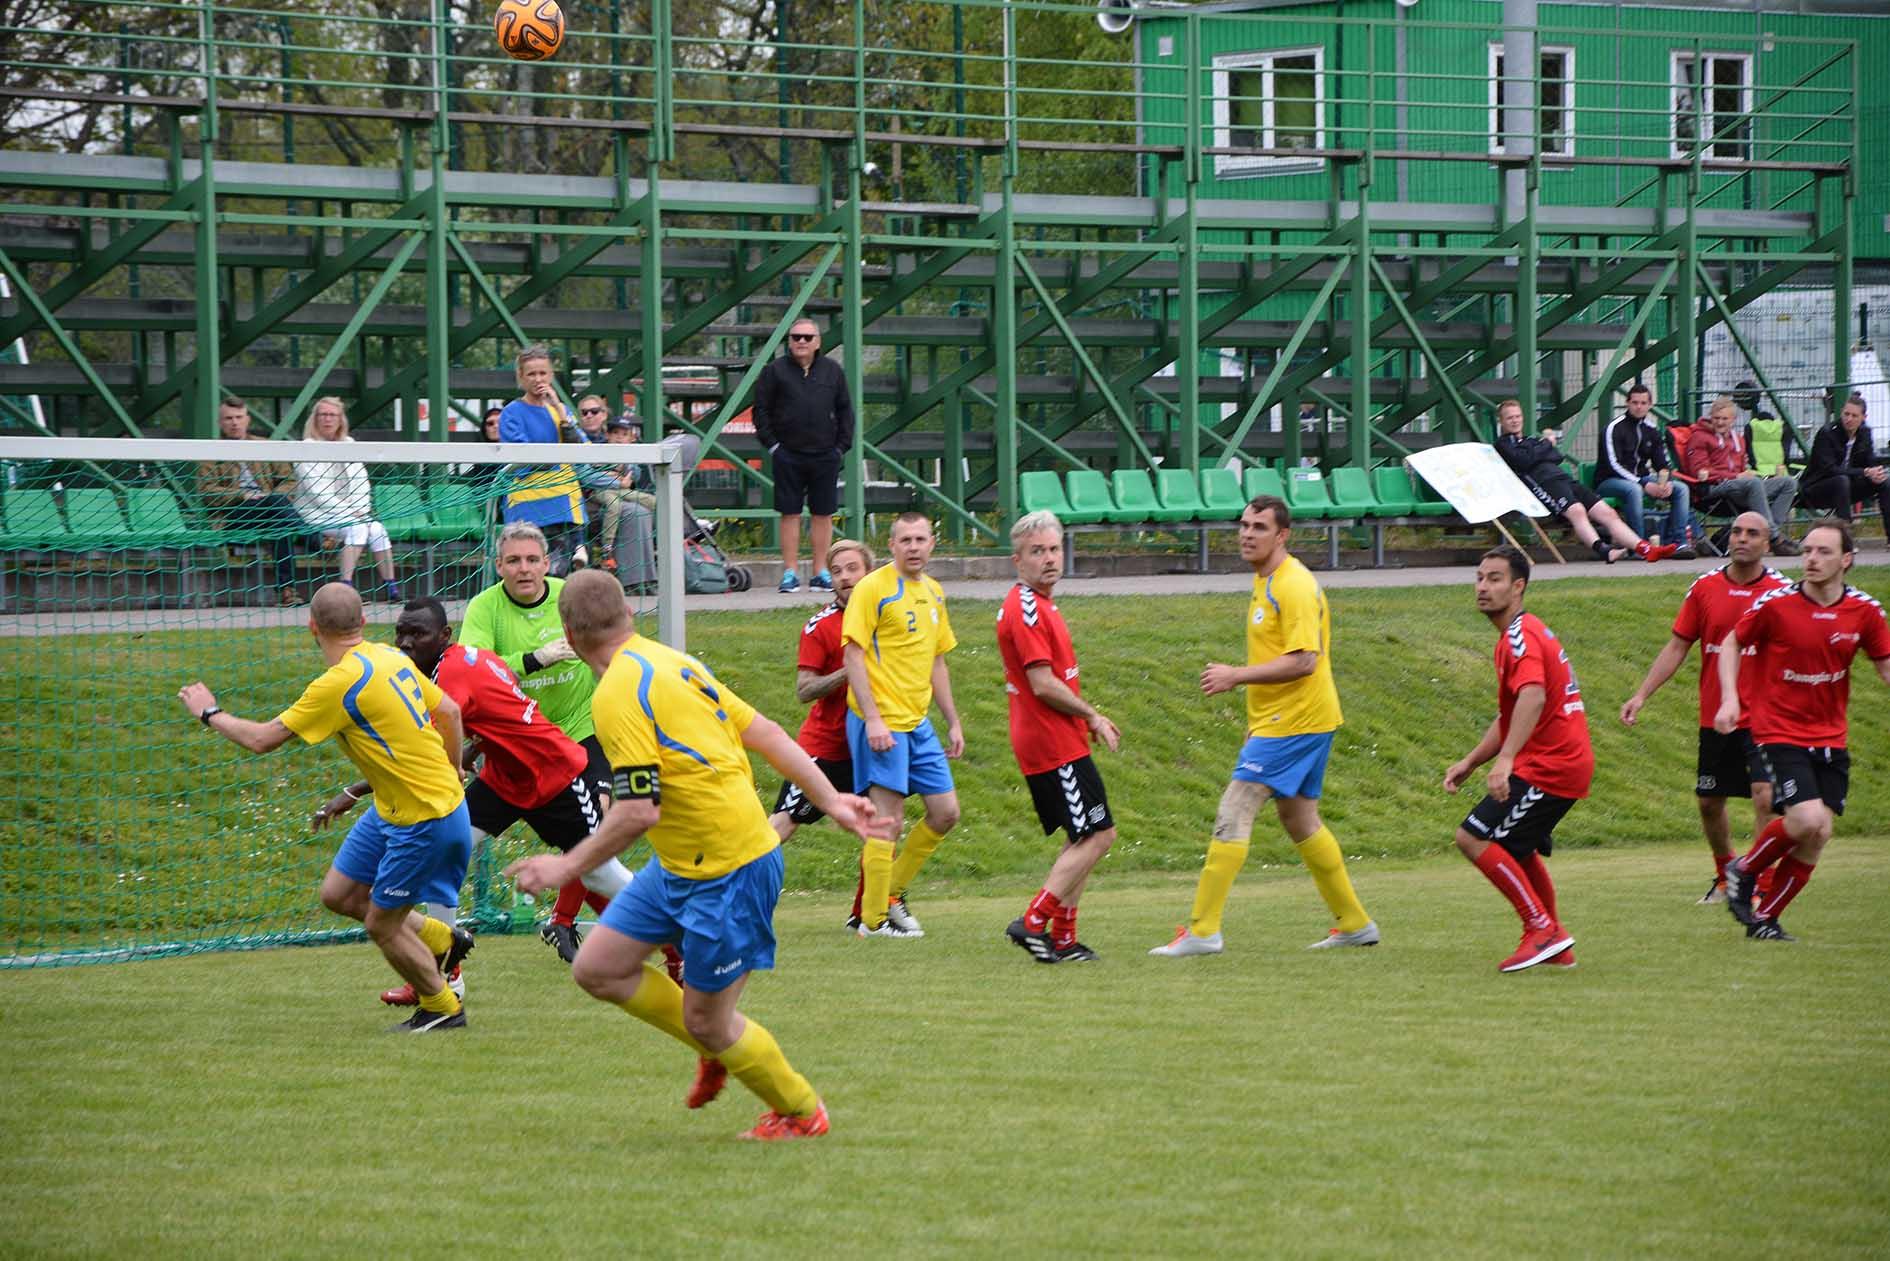 2017.05.27 Football tournament (9)